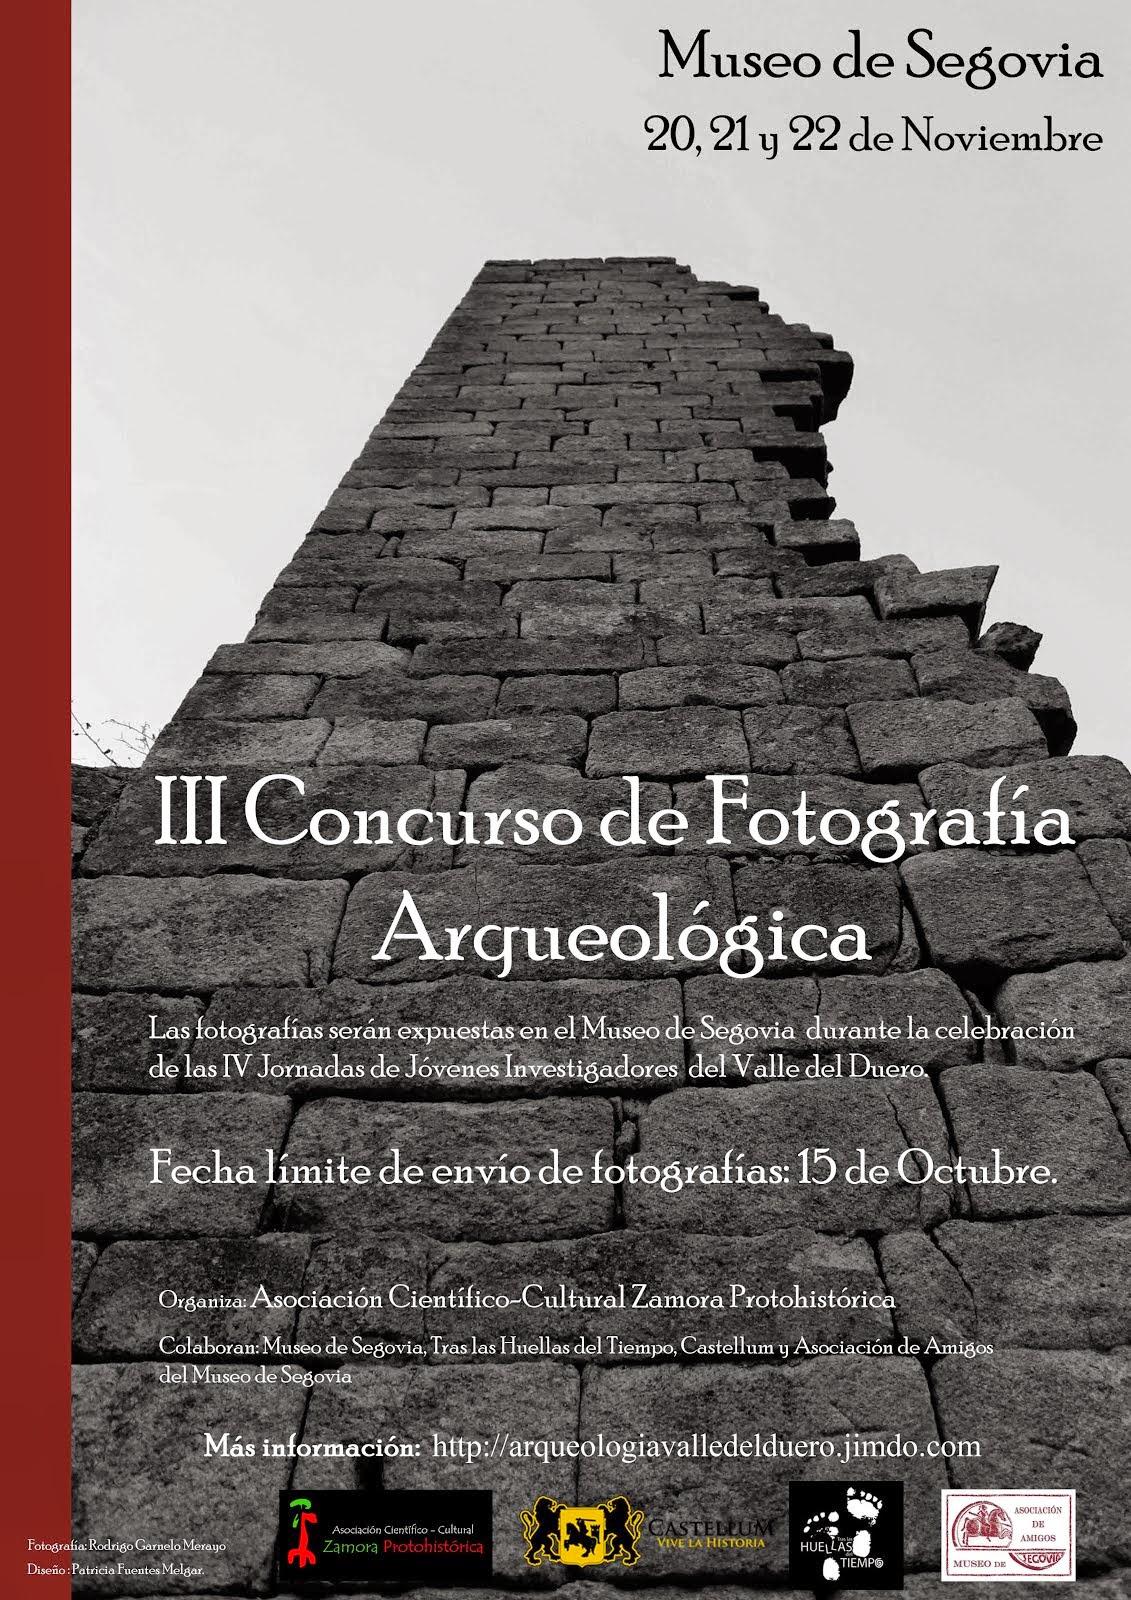 III Concurso de Fotografia Arqueológica Zamoraprotohistorica